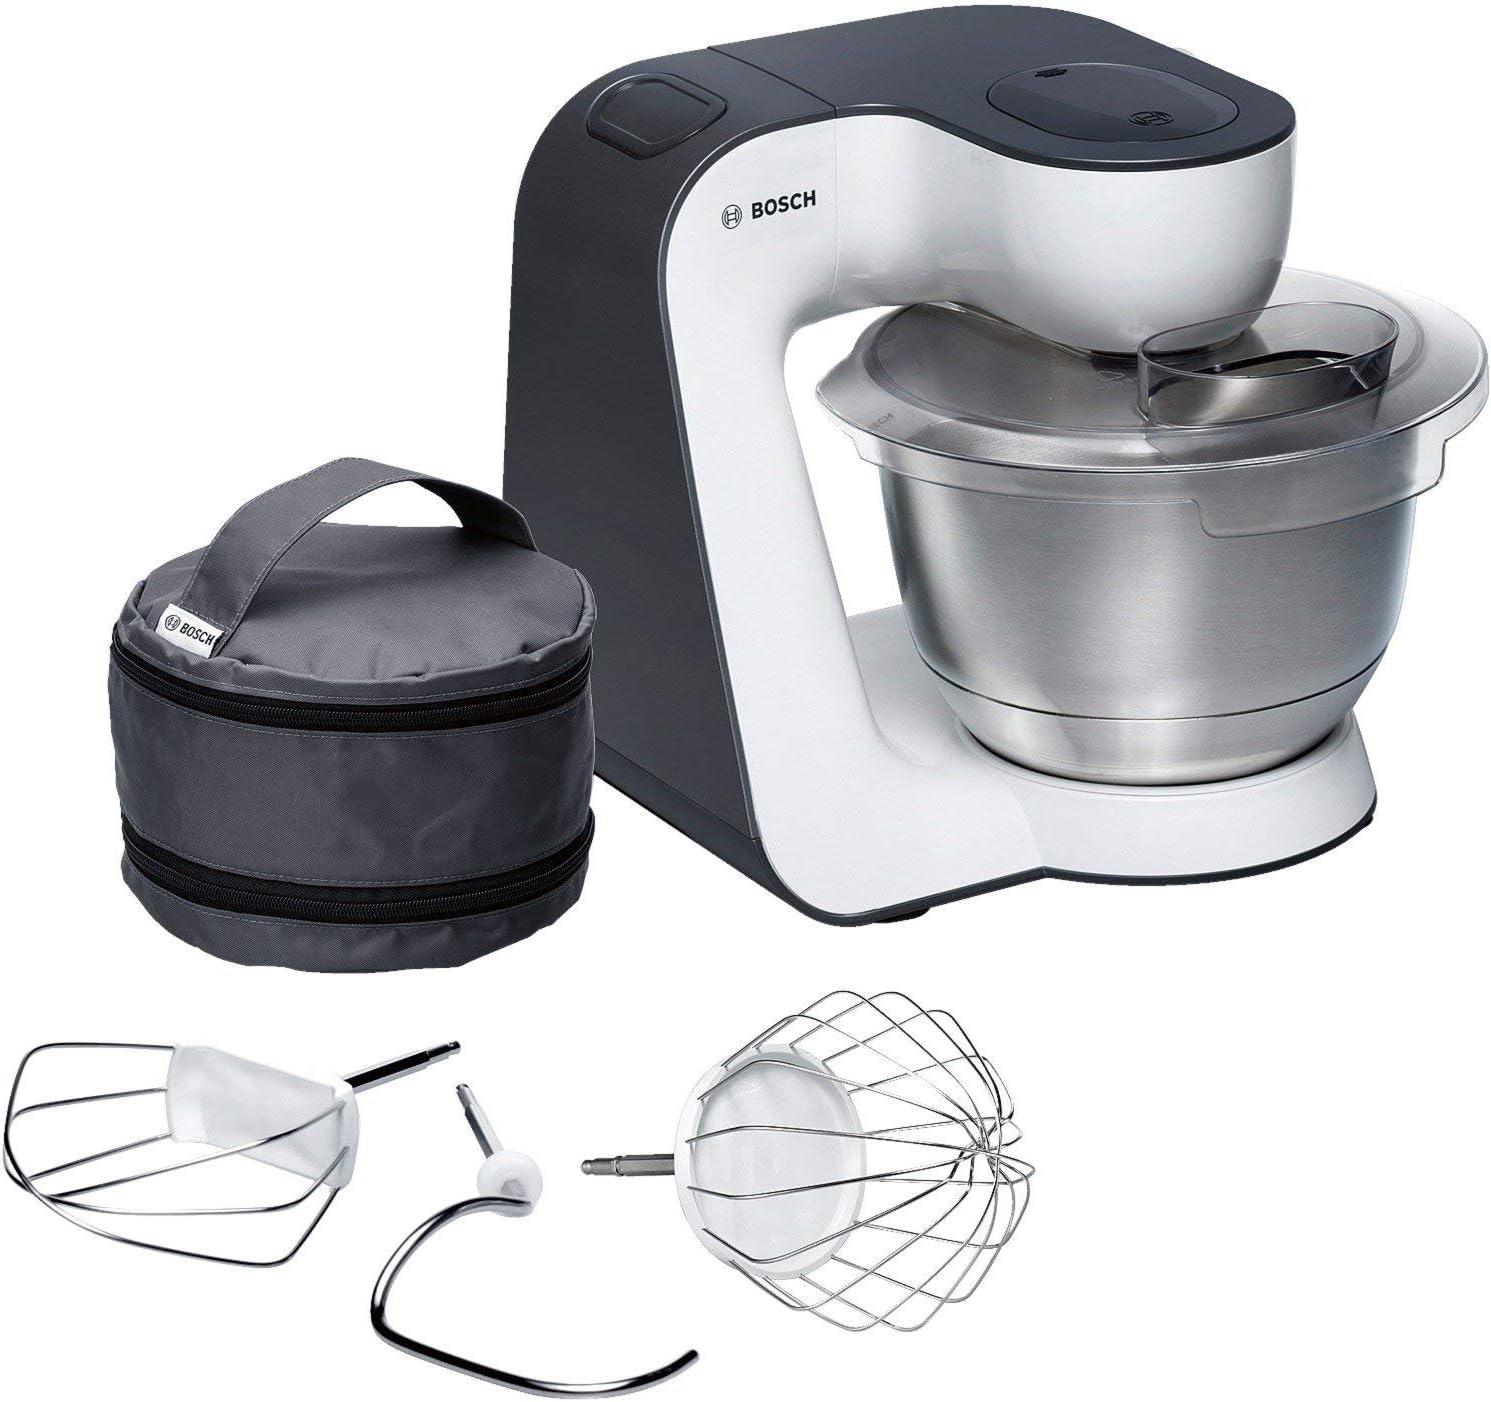 Bosch MUM54A00 900W 3.9L Negro, Plata, Color blanco - Robot de cocina (3,9 L, Negro, Plata, Blanco, 1,1 m, 900 W, 220 - 240, 50 - 60)